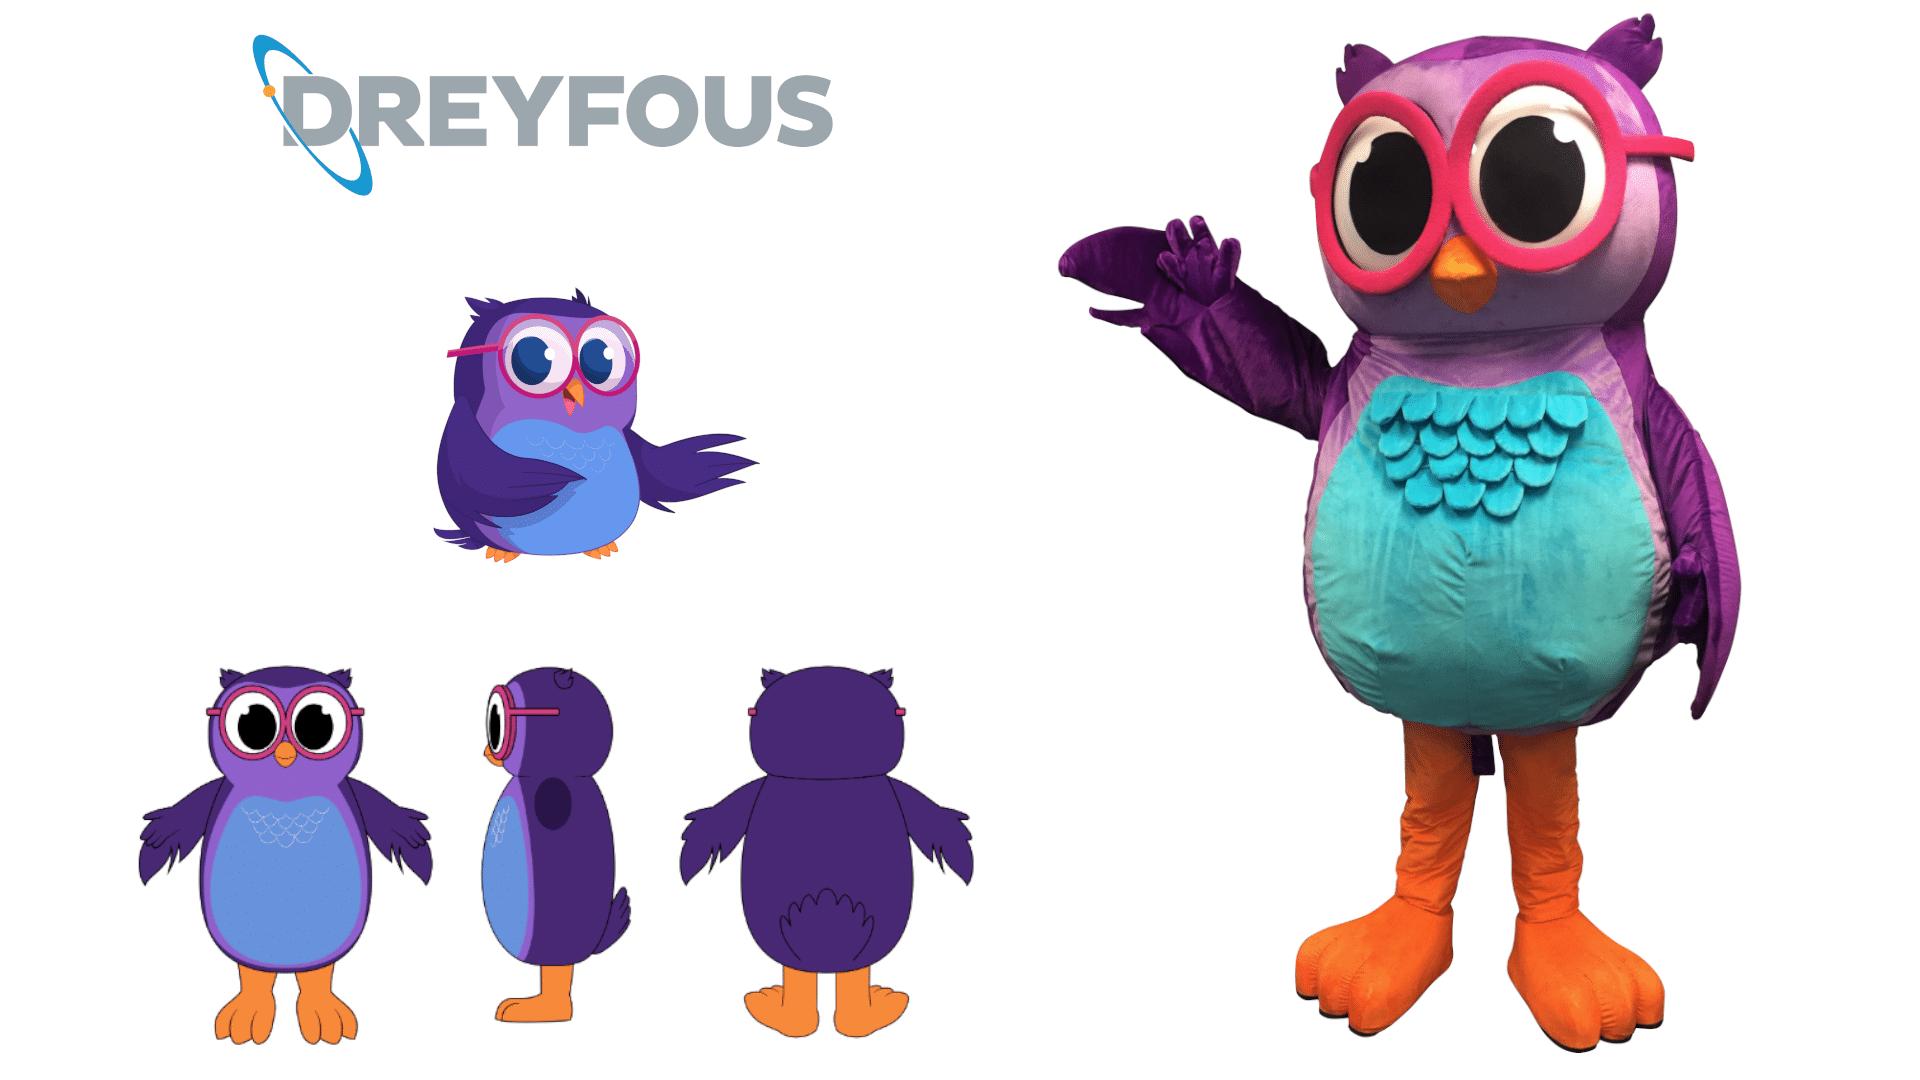 Custom-Mascot-Costume-Owl-Dreyfous-Assoc-by-Promo-Bears